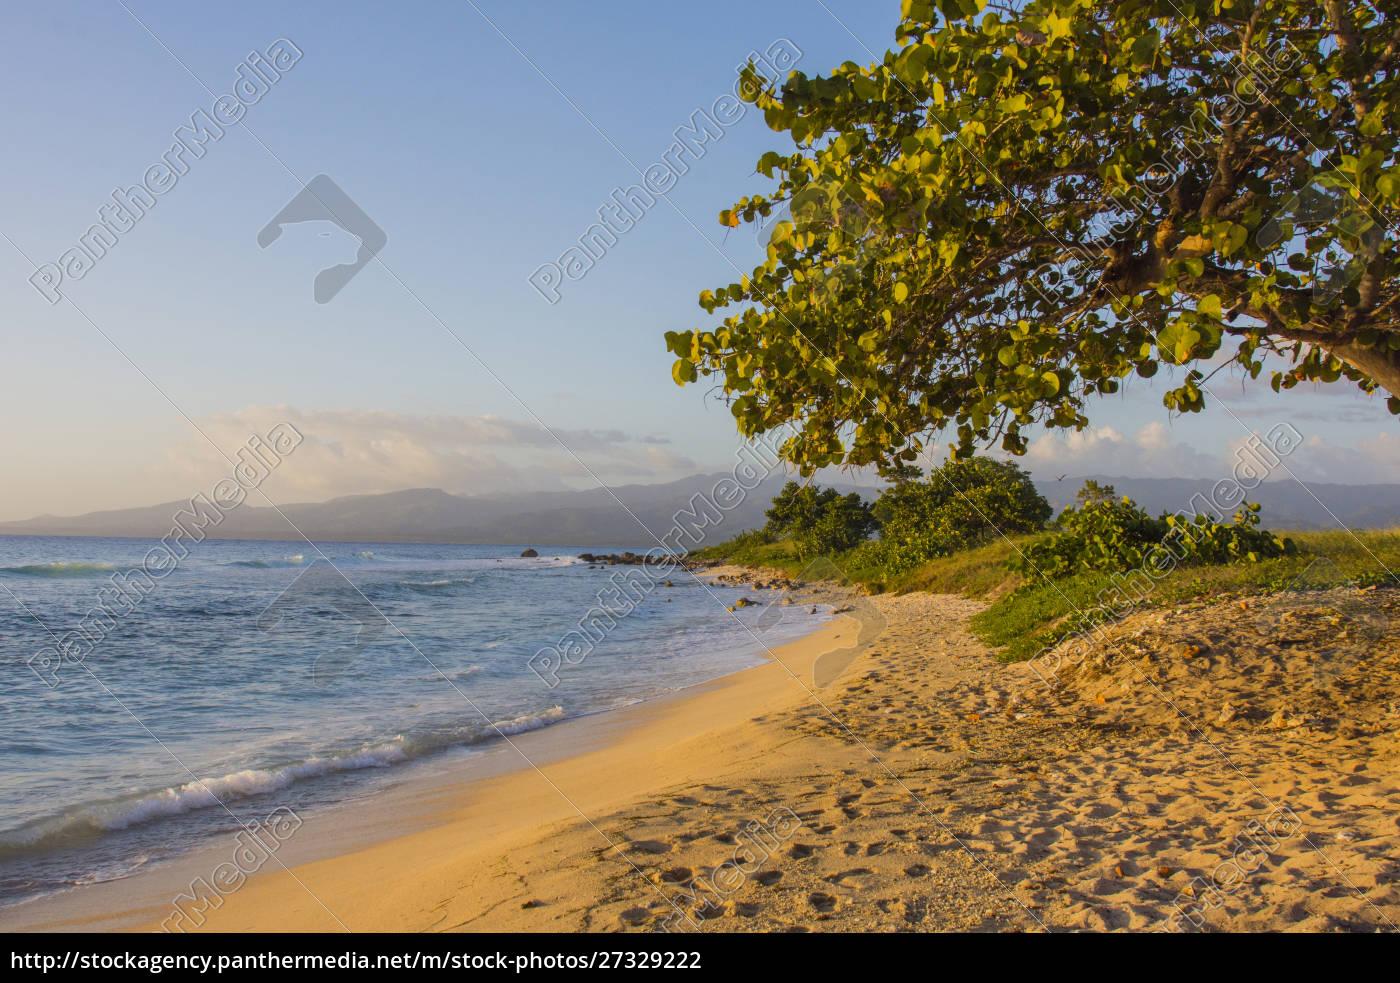 cuba., sancti, spiritus, province., trinidad., beach - 27329222